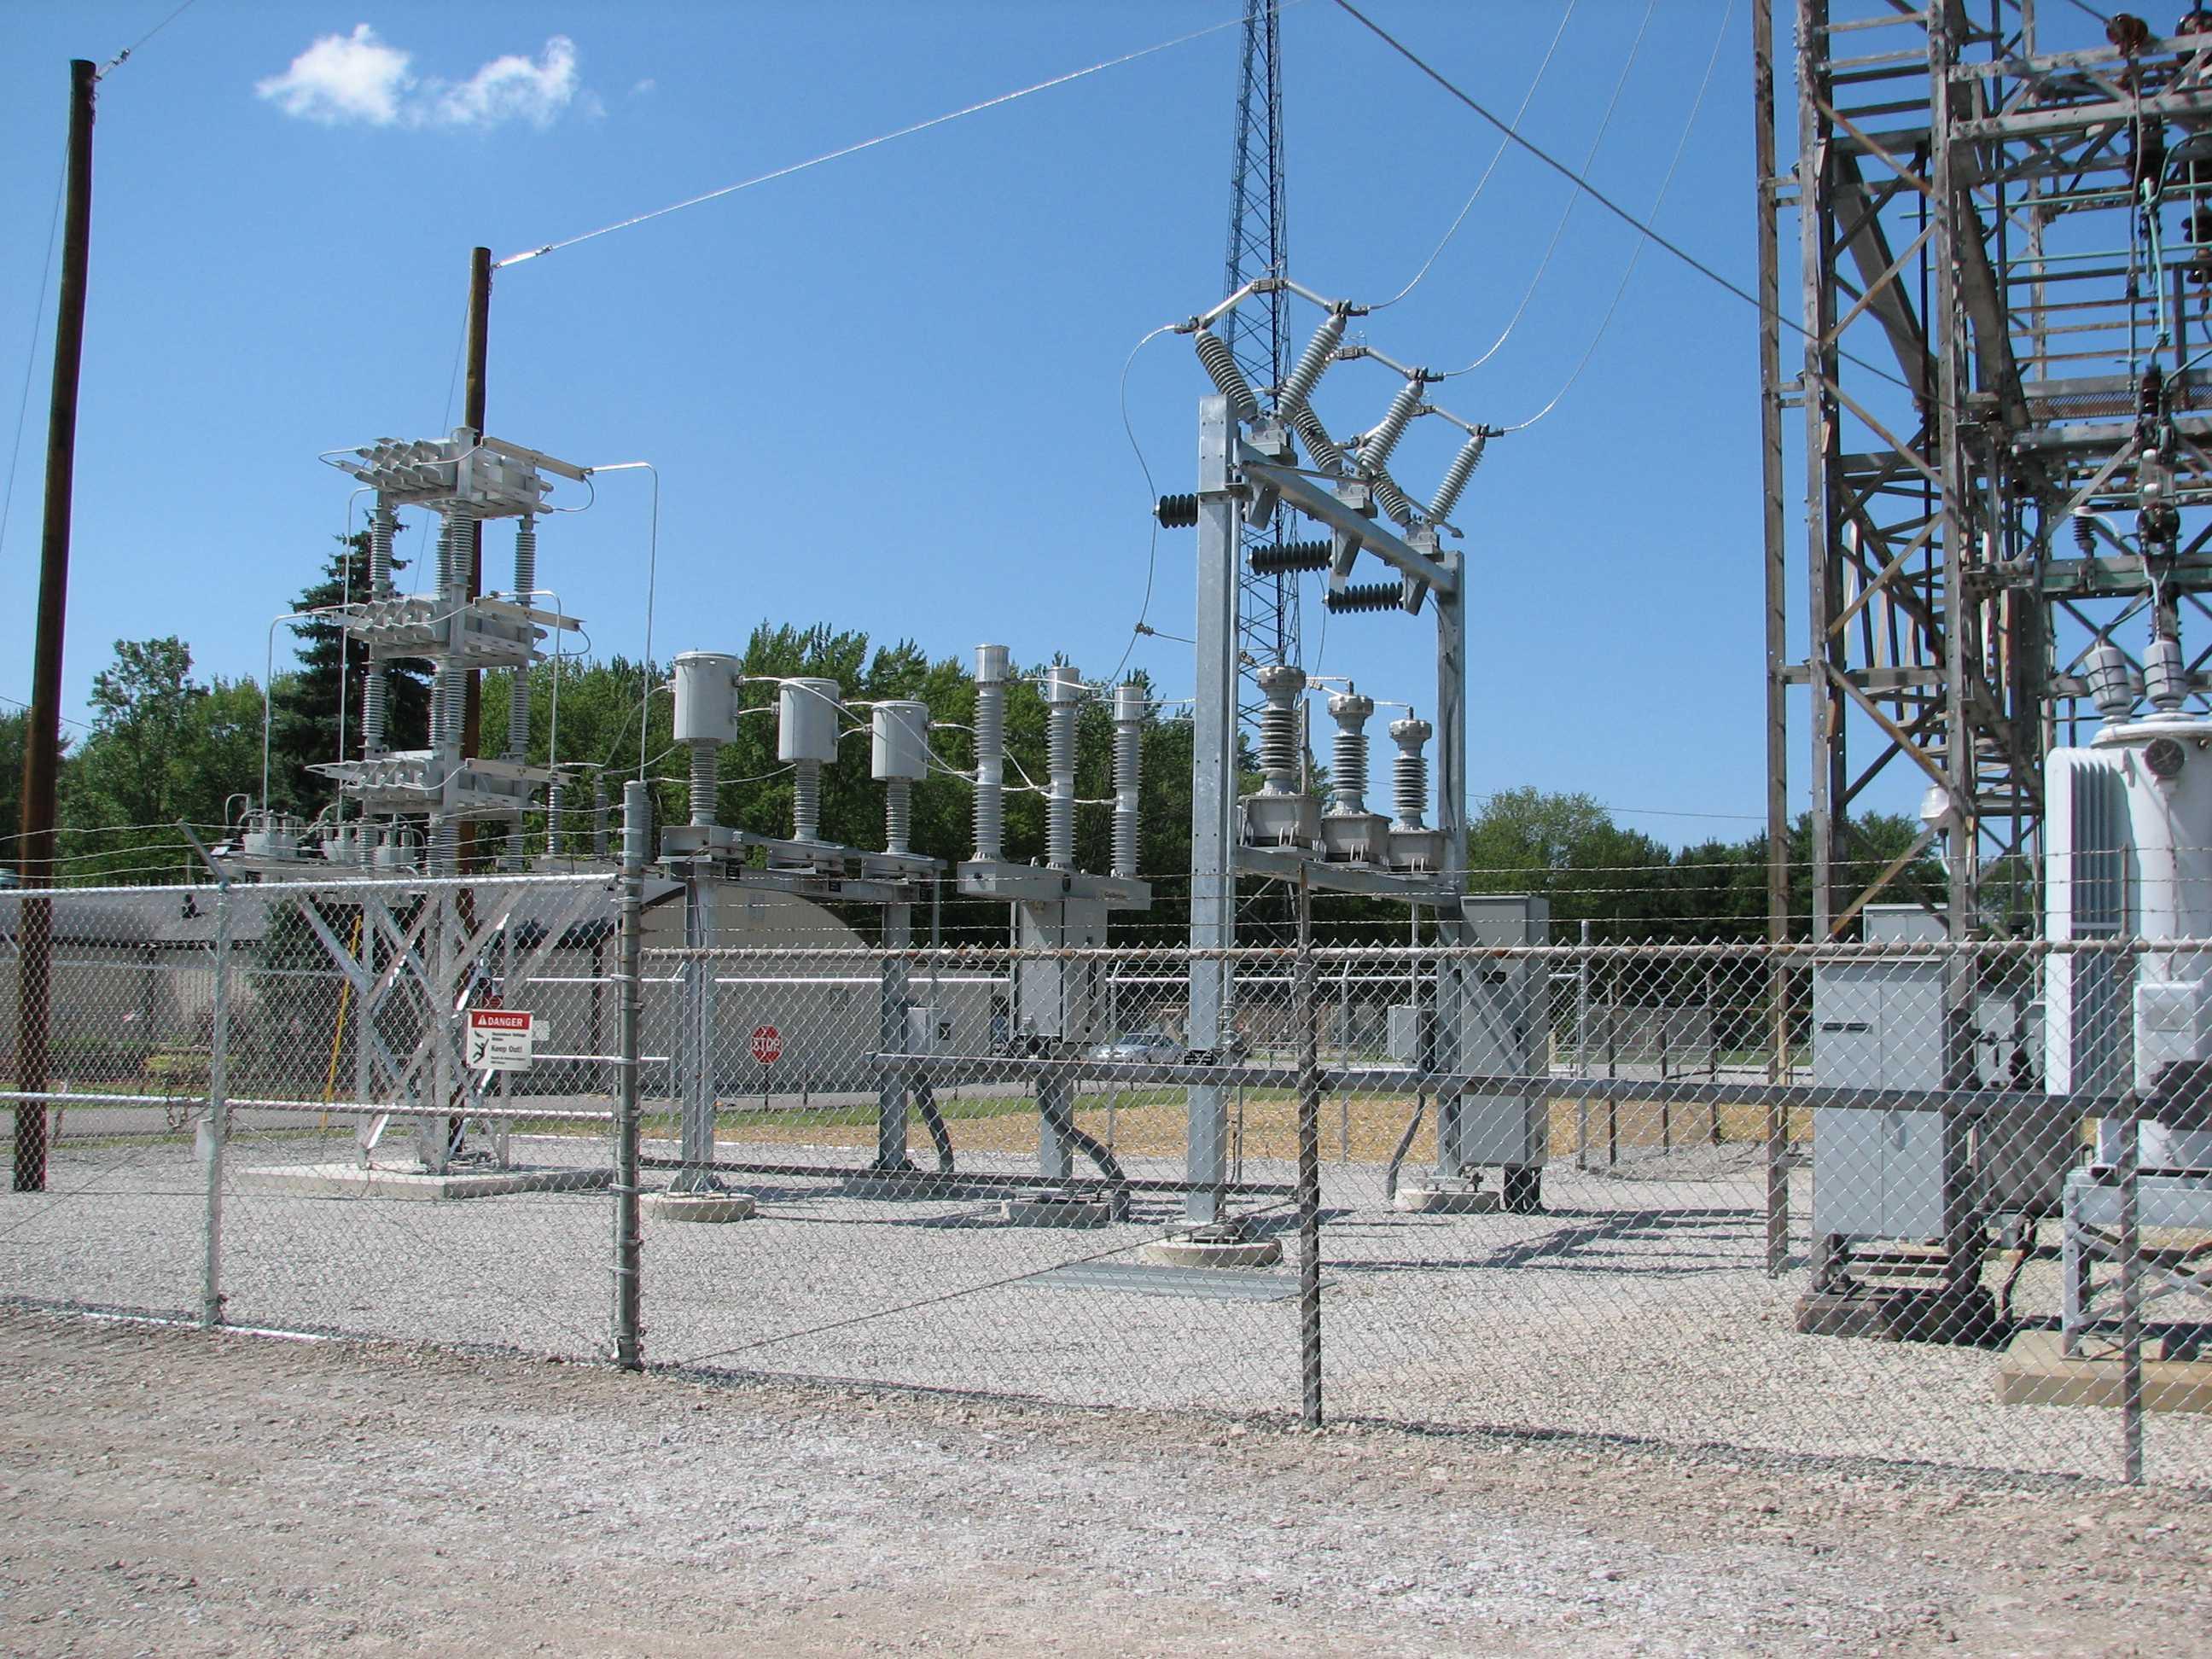 electric boiler wiring diagrams real human diagram capacitor bank installation - jrje